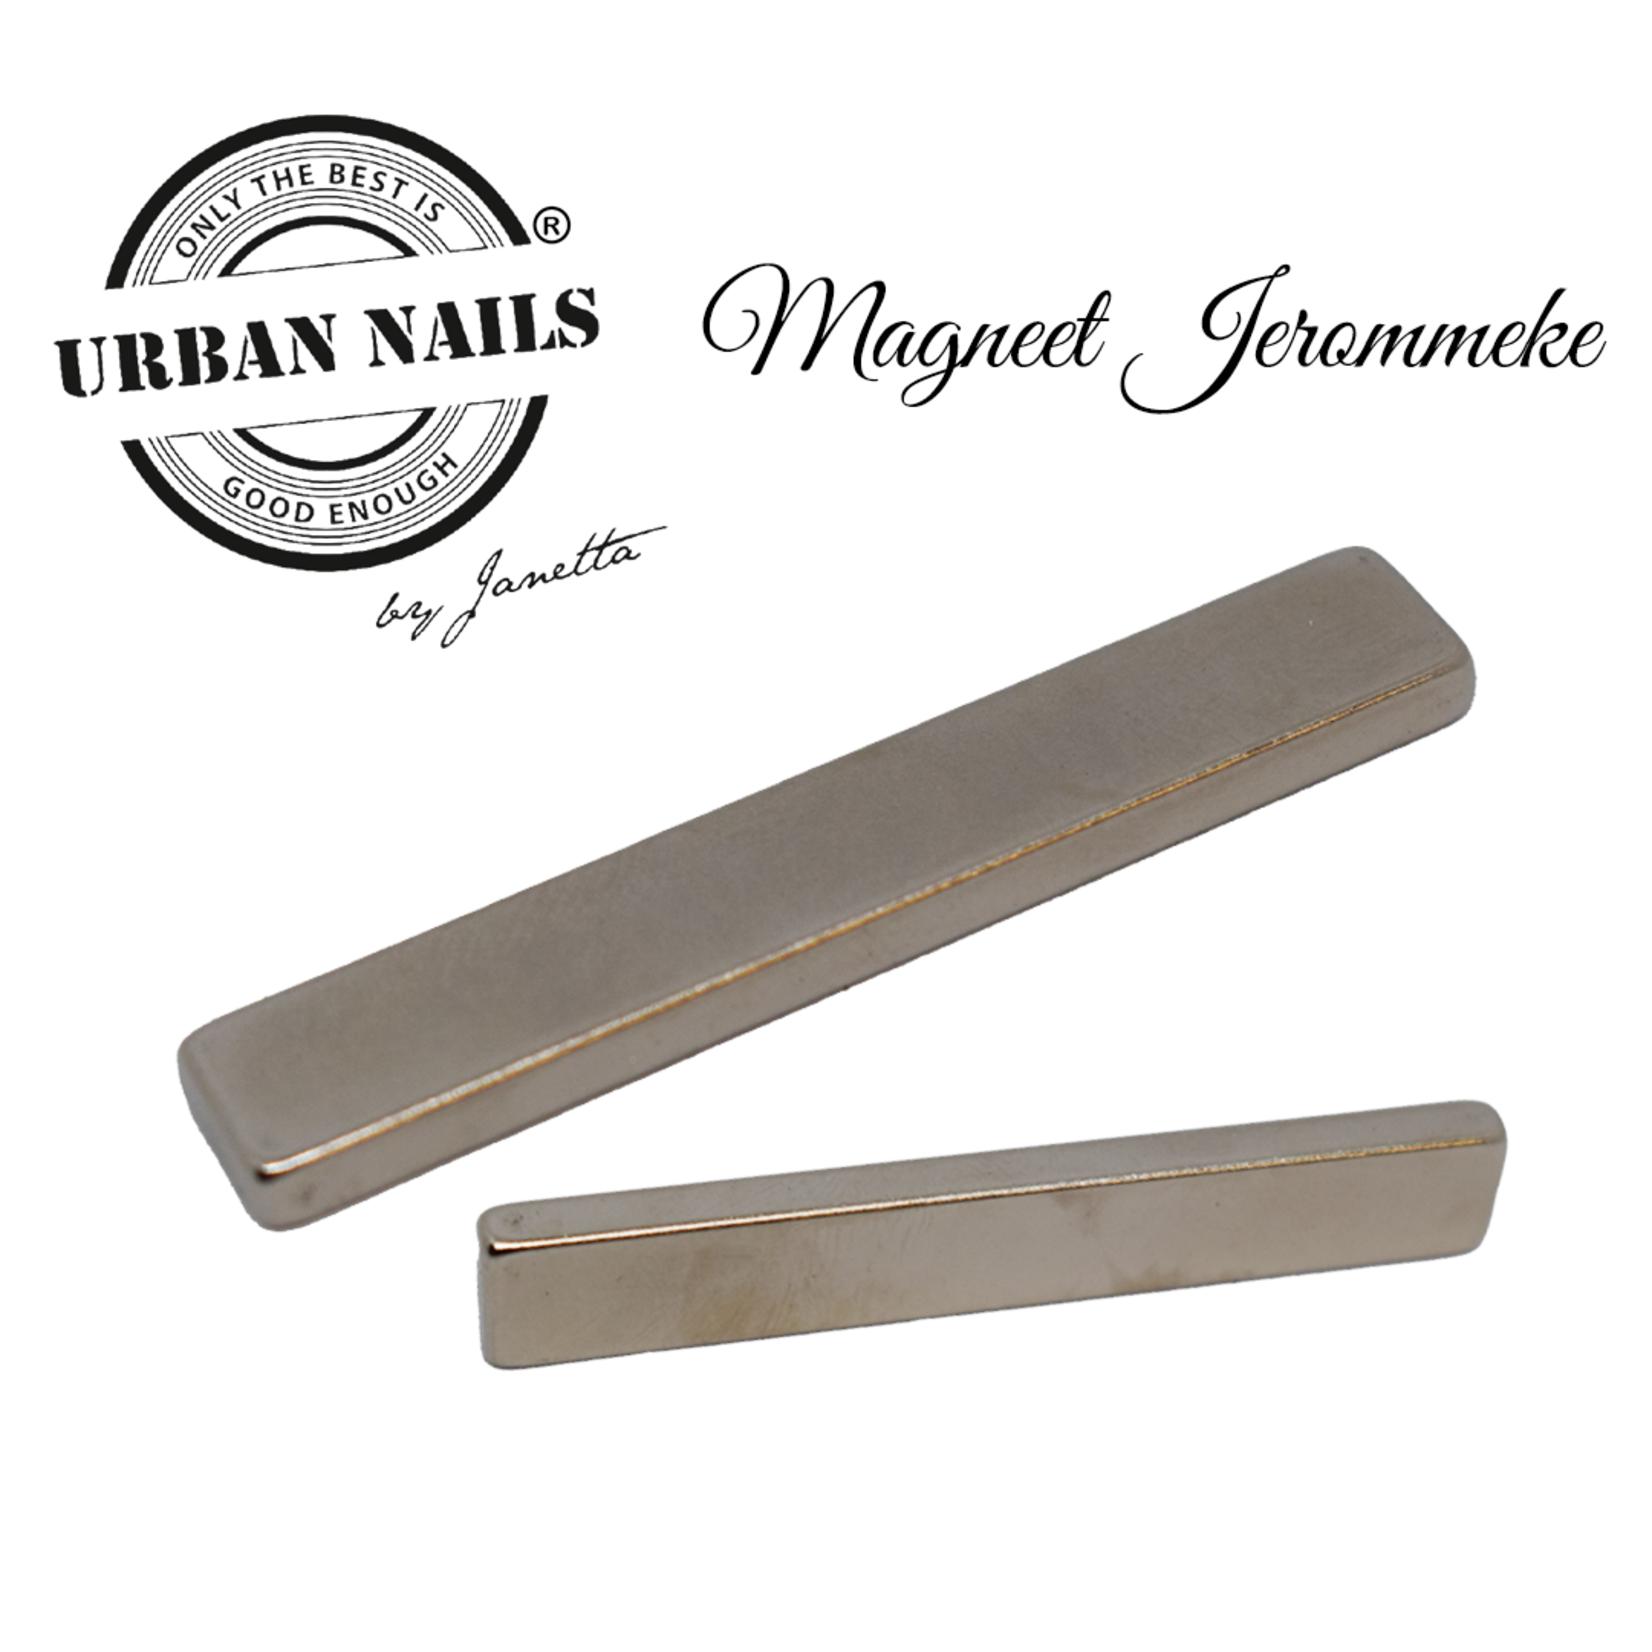 Urban Nails Magneet Jerommeke